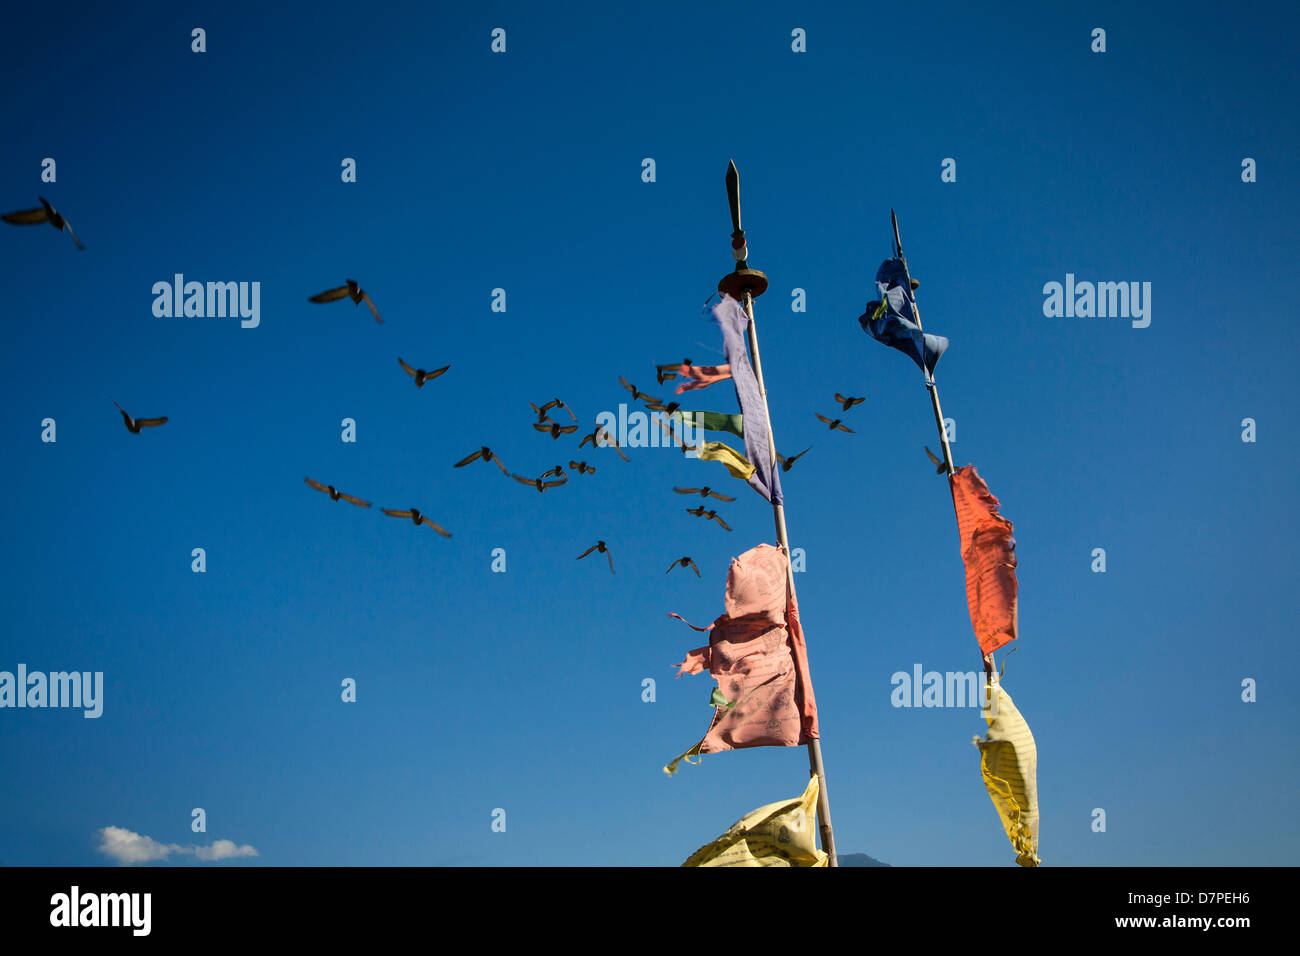 Prayer flags dot the landscape in Bhutan. - Stock Image